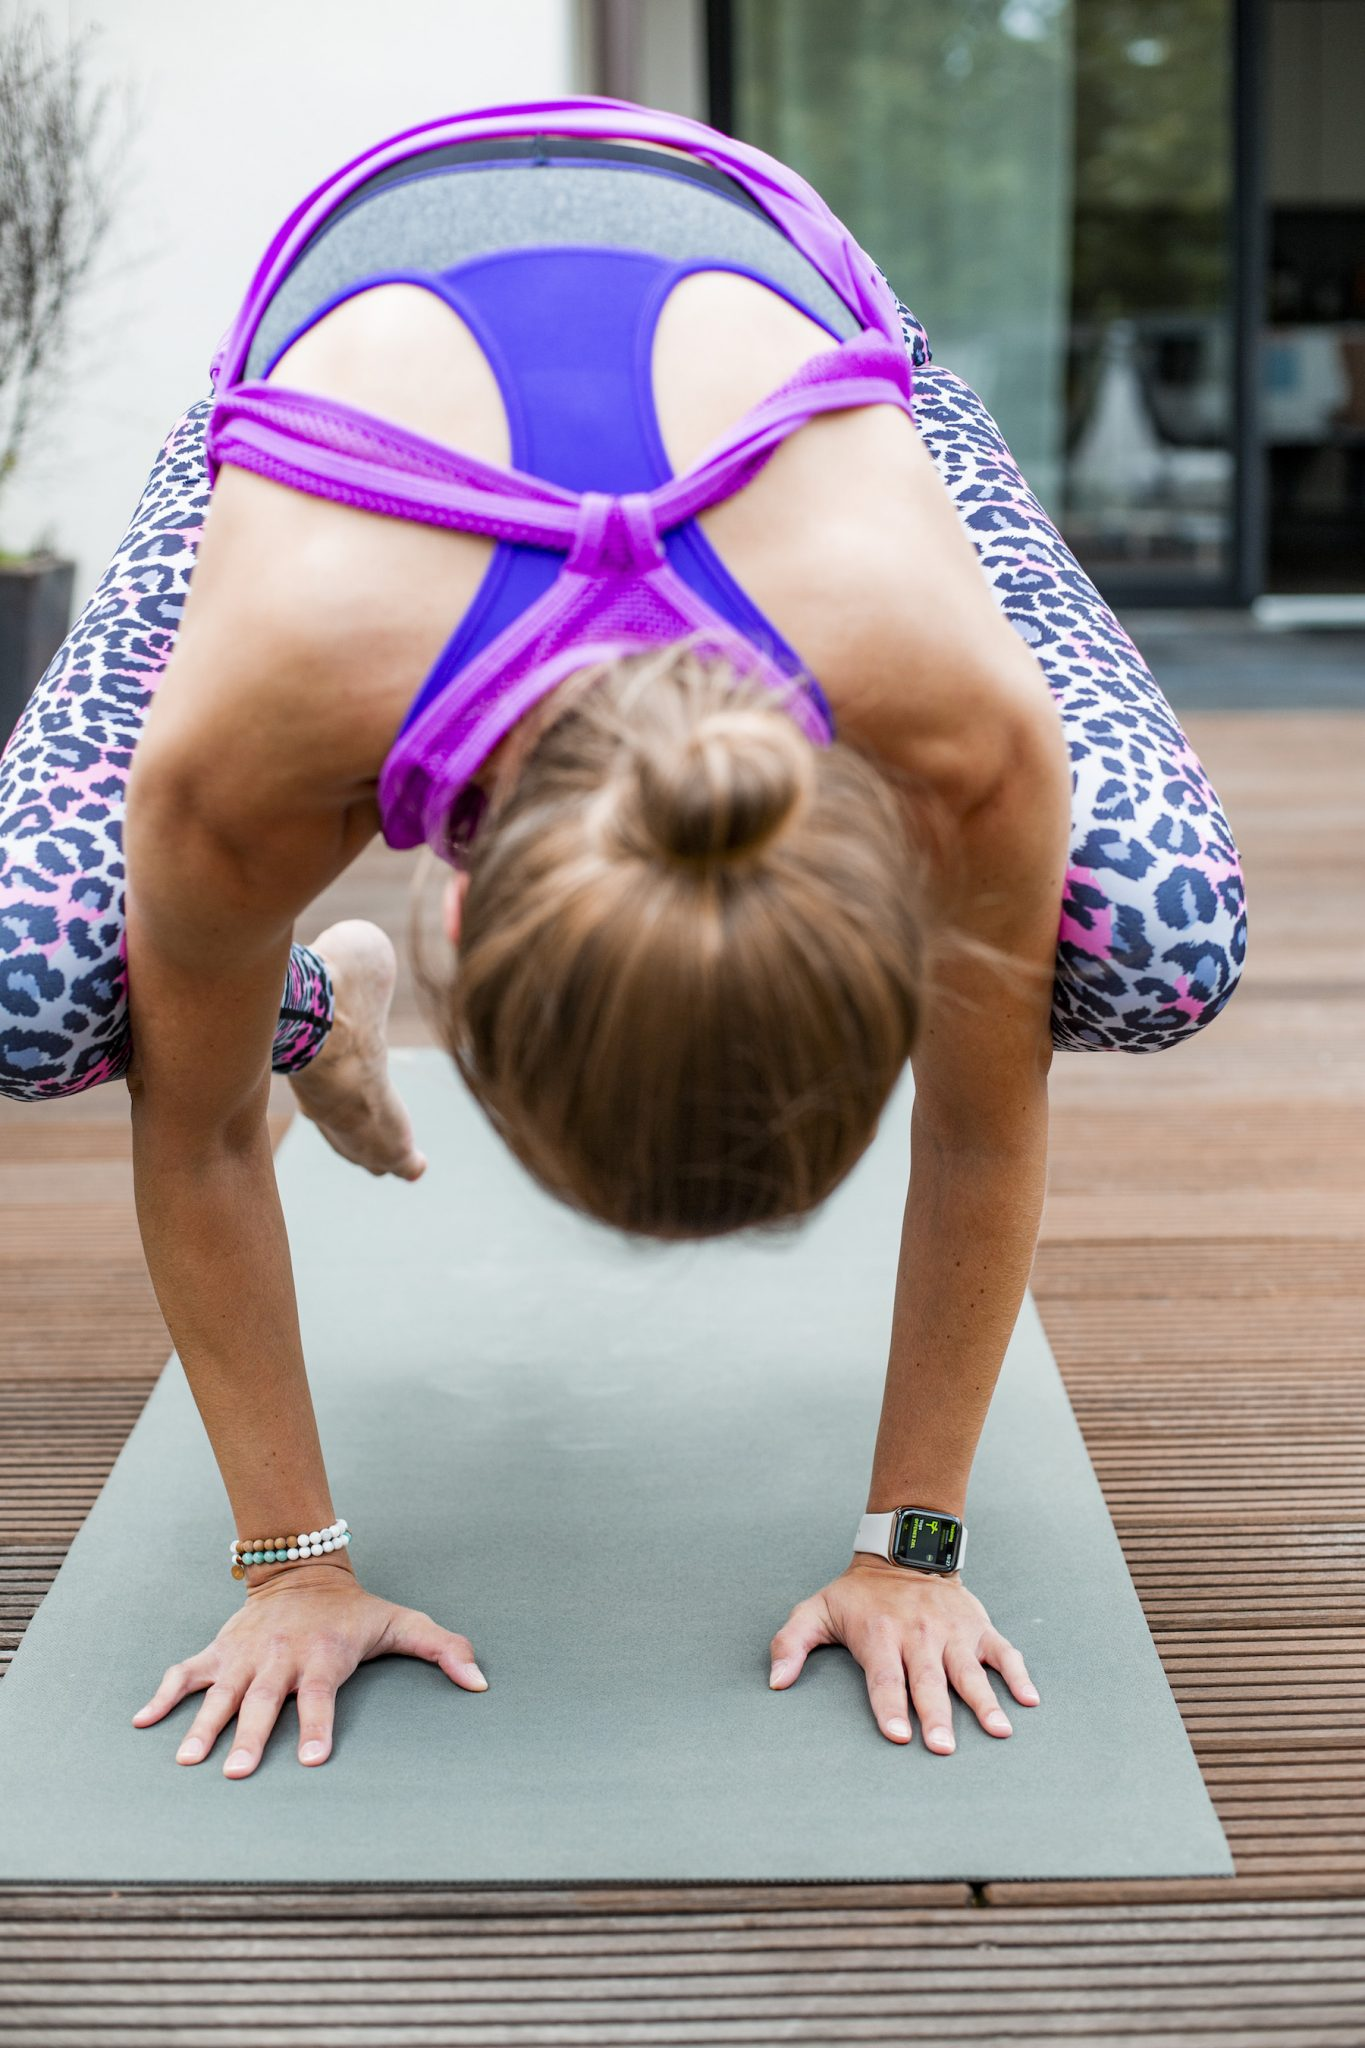 suelovesnyc_susan_fengler_stressmanagement_apps_gegen_stress_apps_apple_watch_yoga